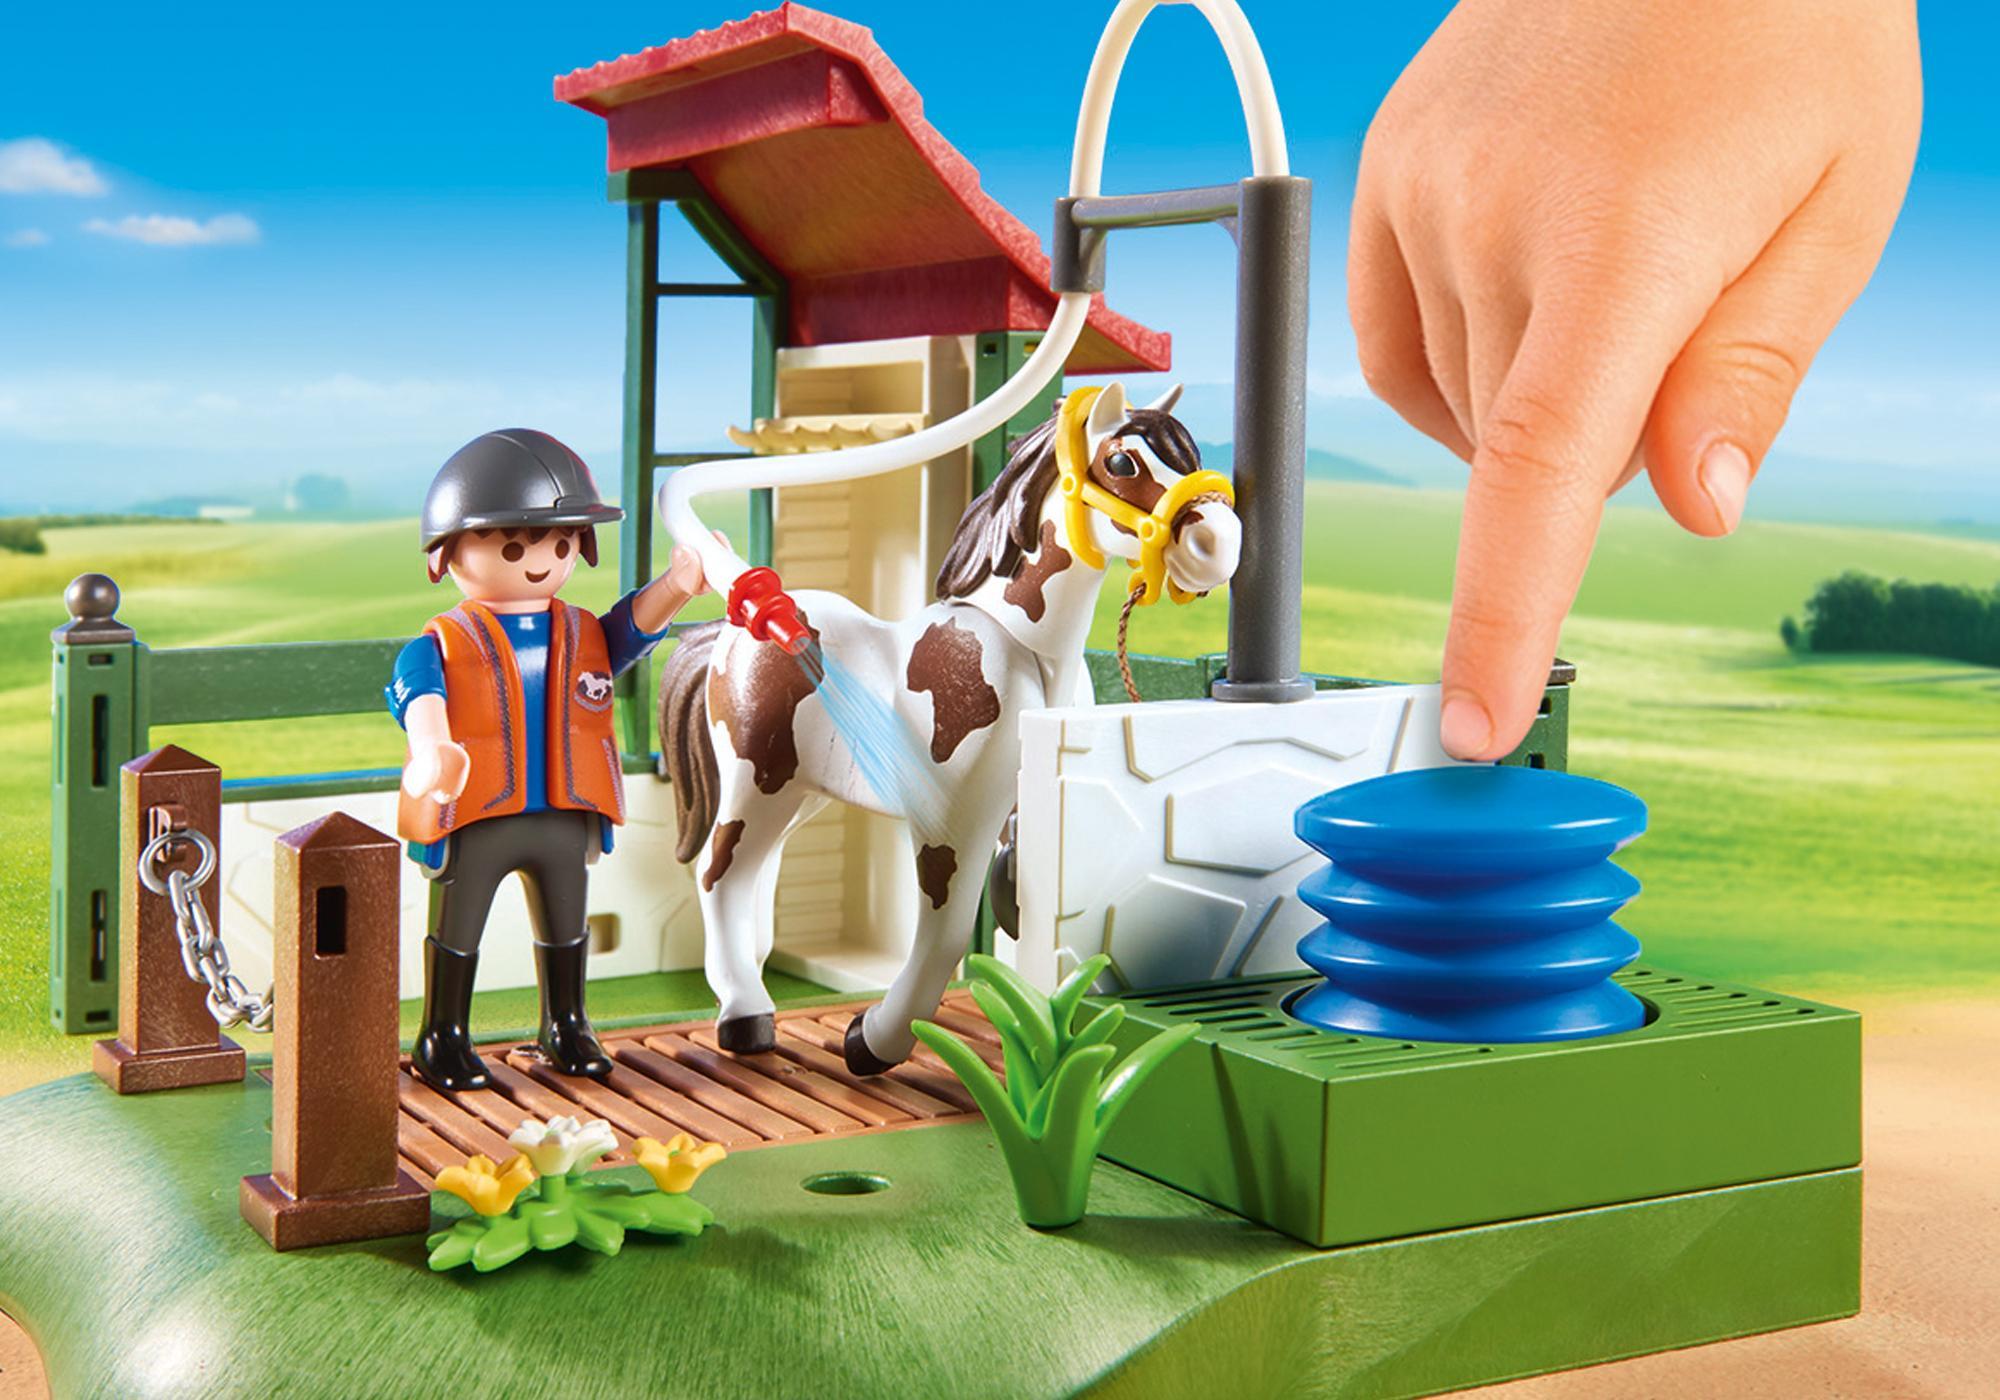 http://media.playmobil.com/i/playmobil/6929_product_extra1/Box de lavage pour chevaux